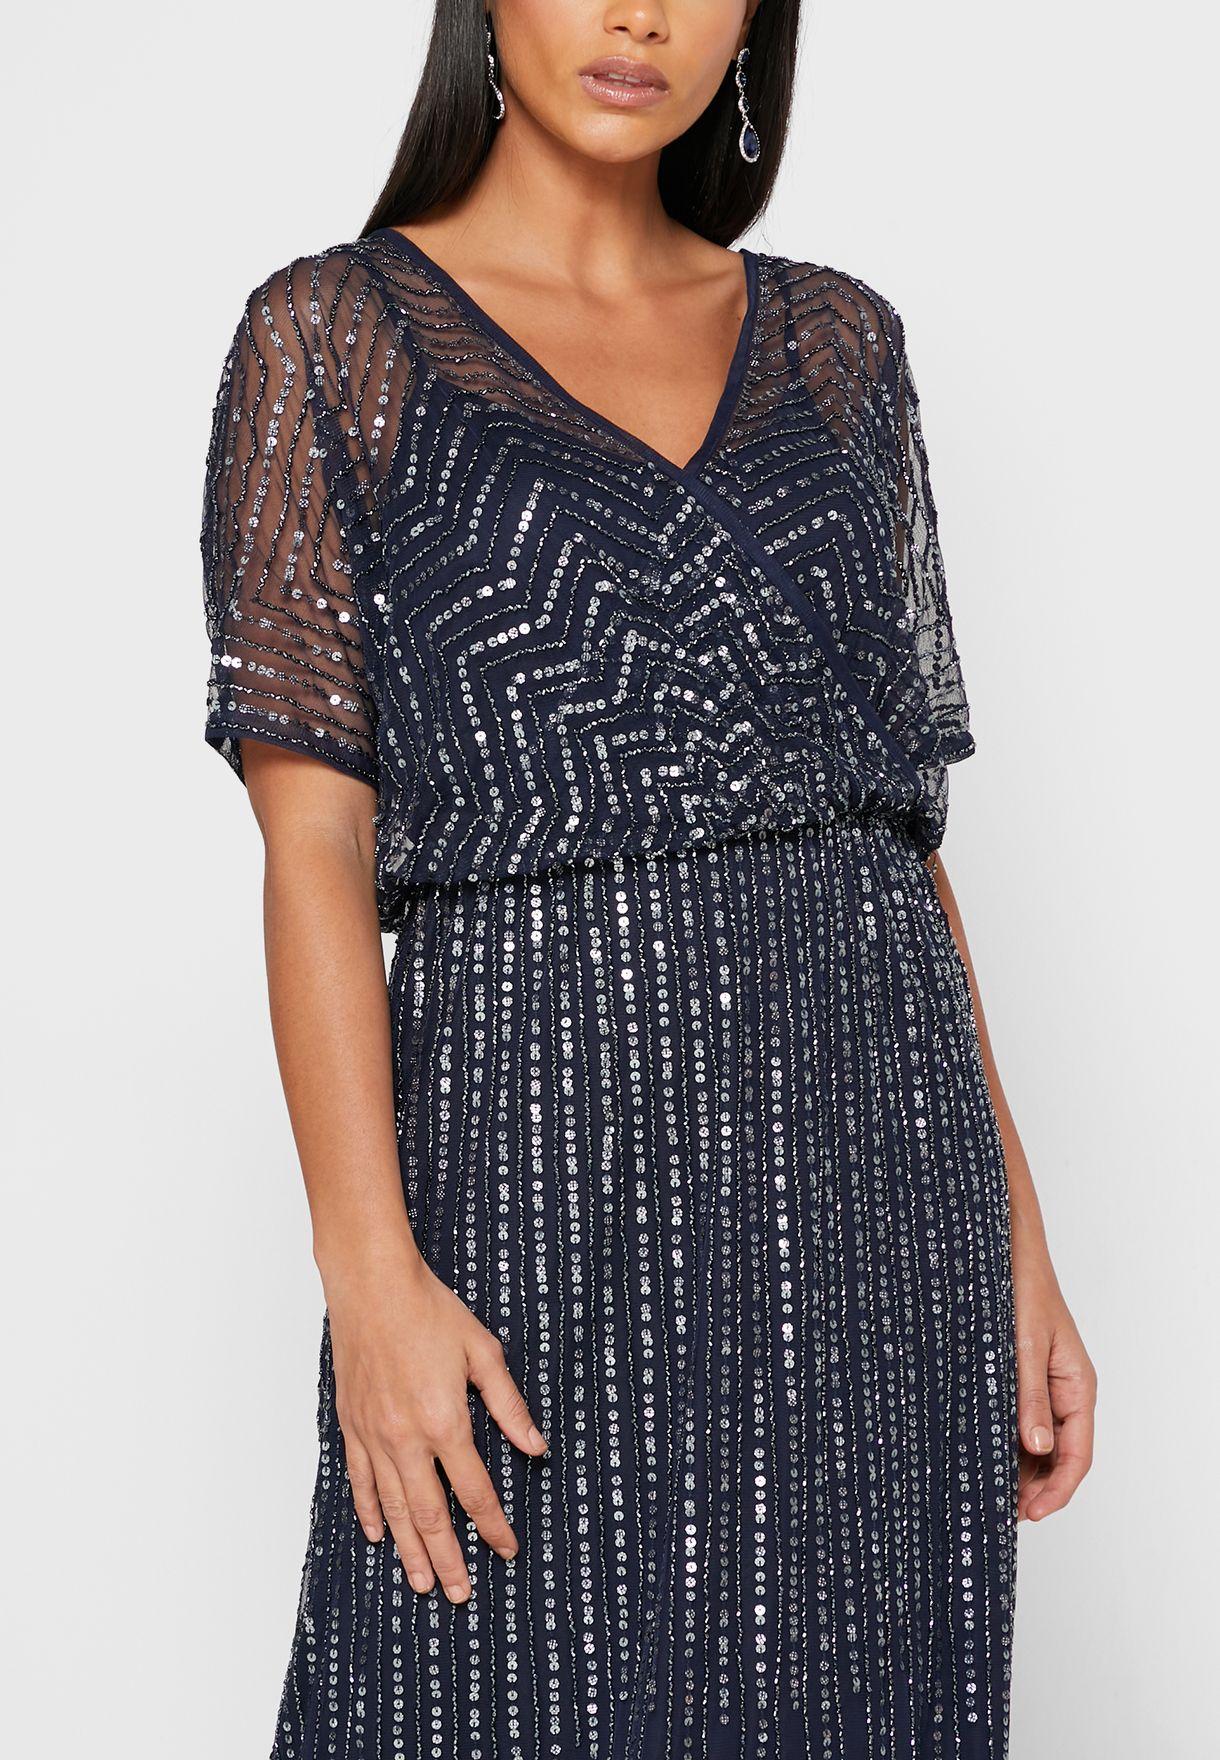 فستان شبك مزين بالترتر